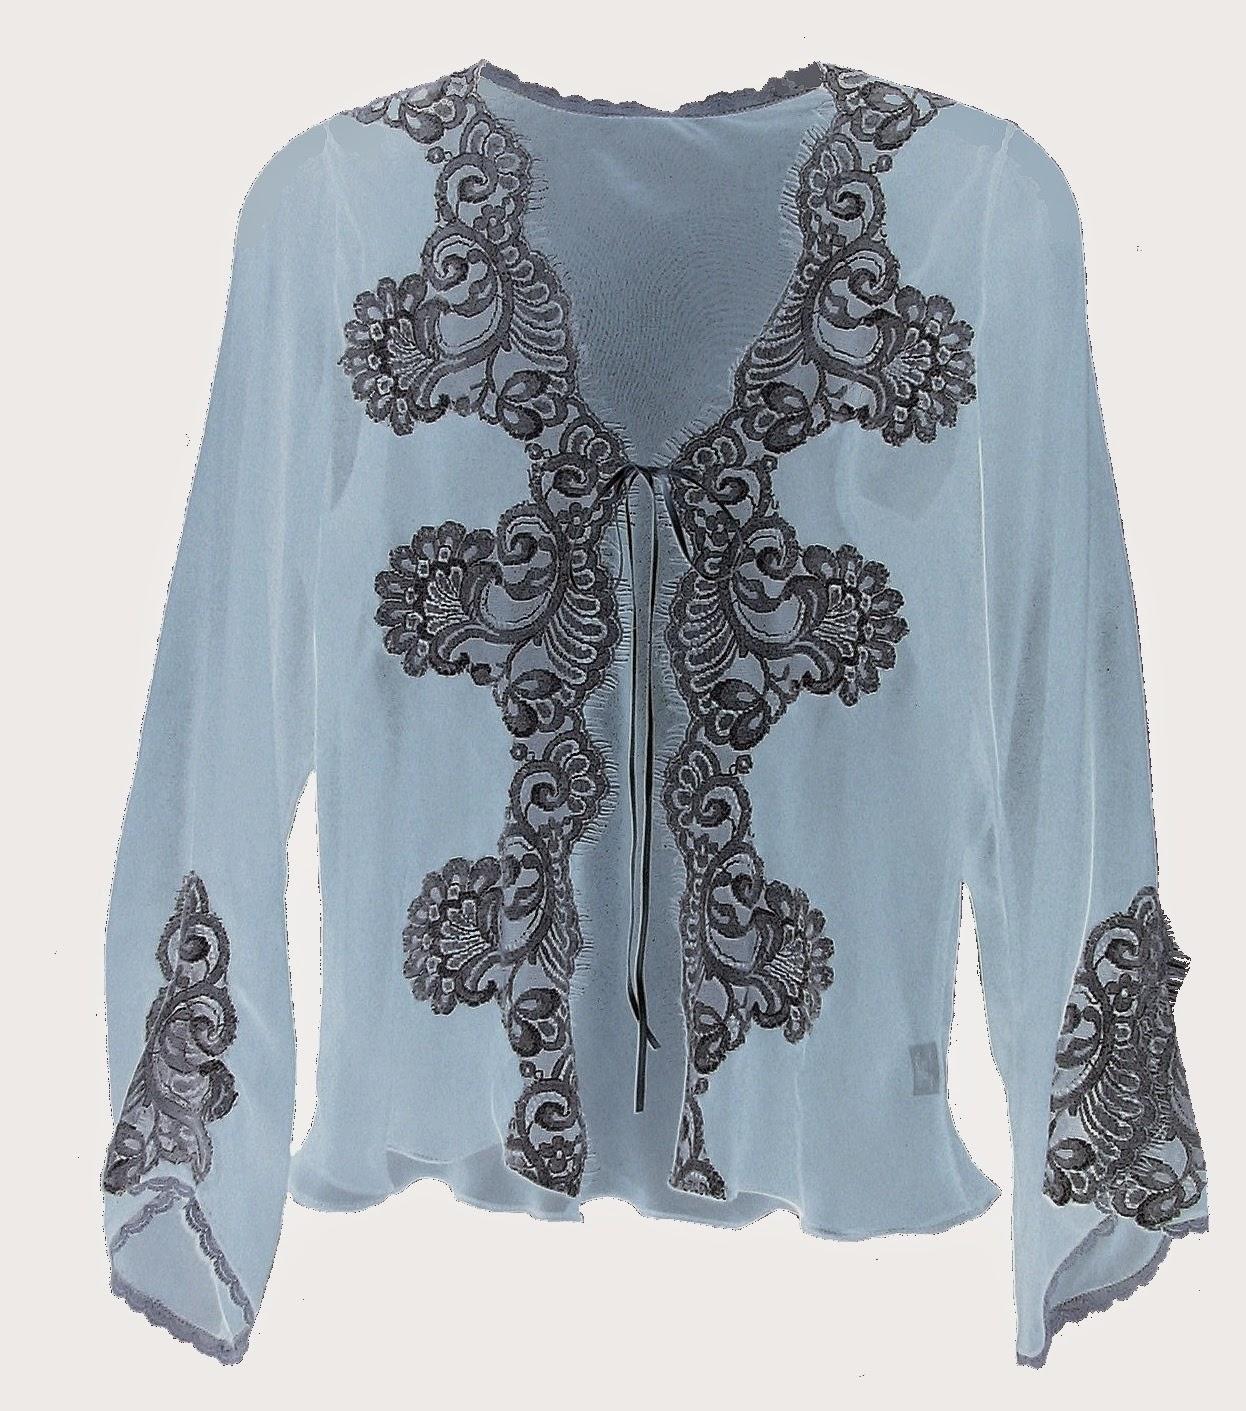 silver chiffon cardigan with lace